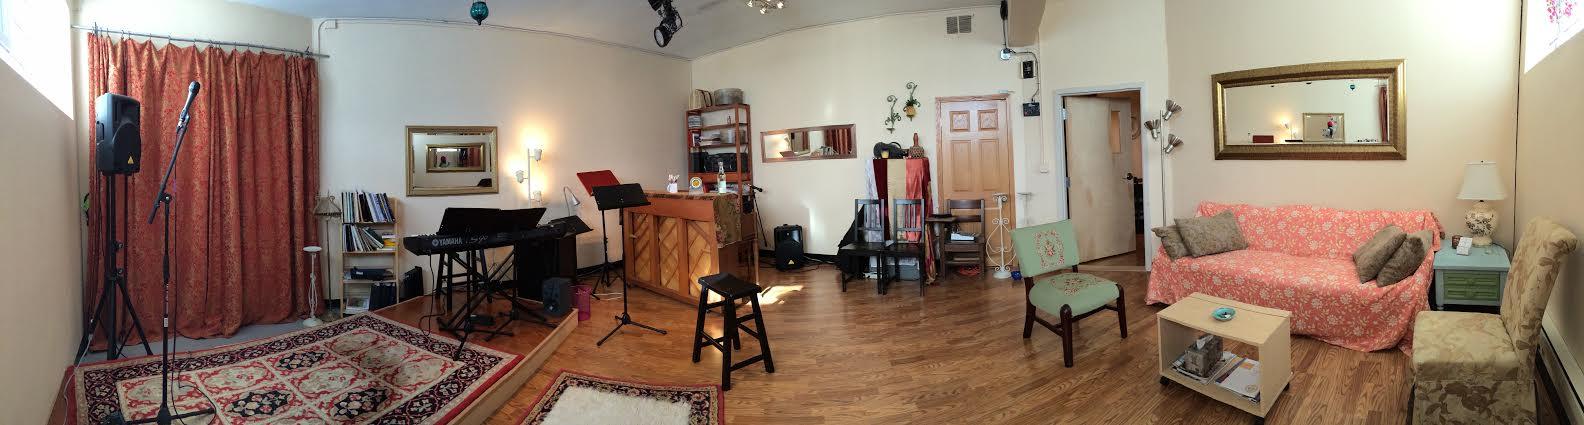 Chanson Voice & Music Academy Studio